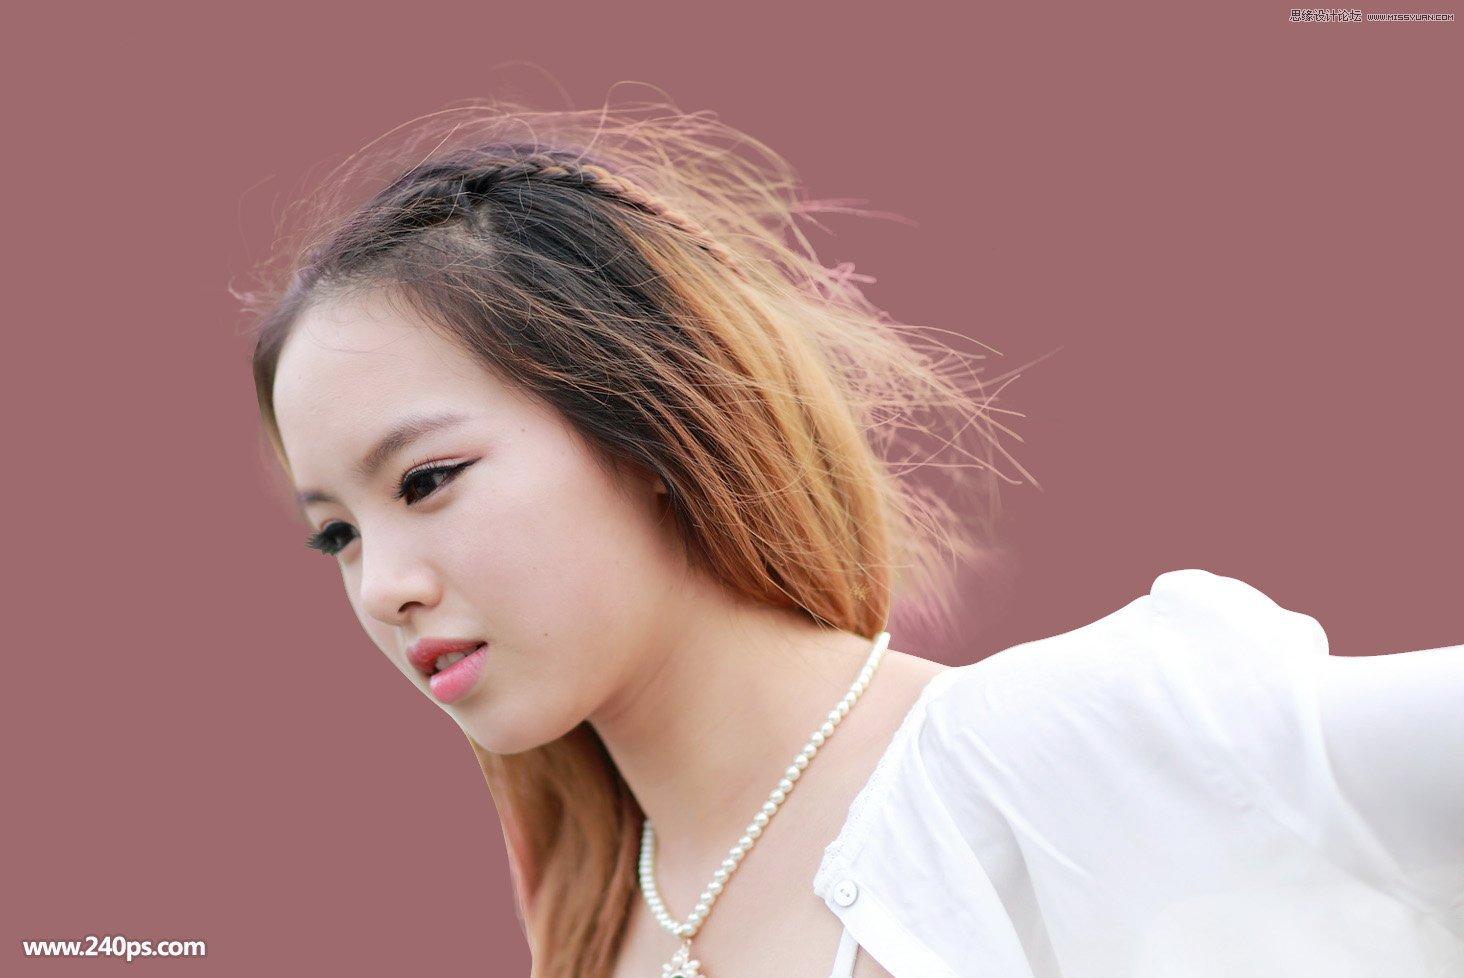 photoshop详细解析如何抠出美女细头发丝